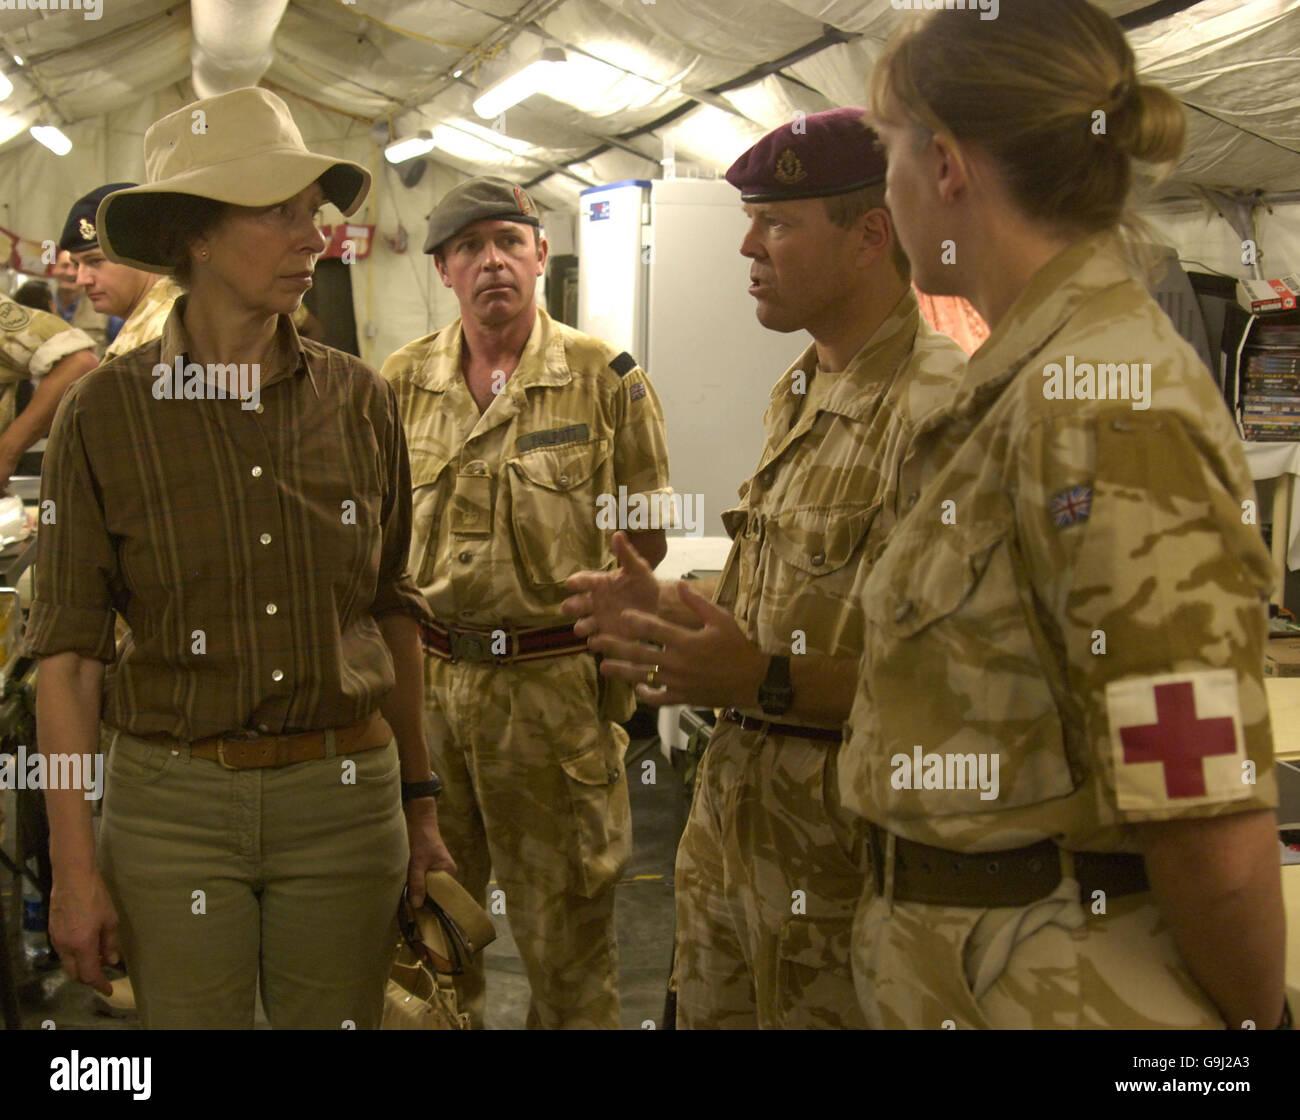 Princess Royal in Afghanistan - Stock Image